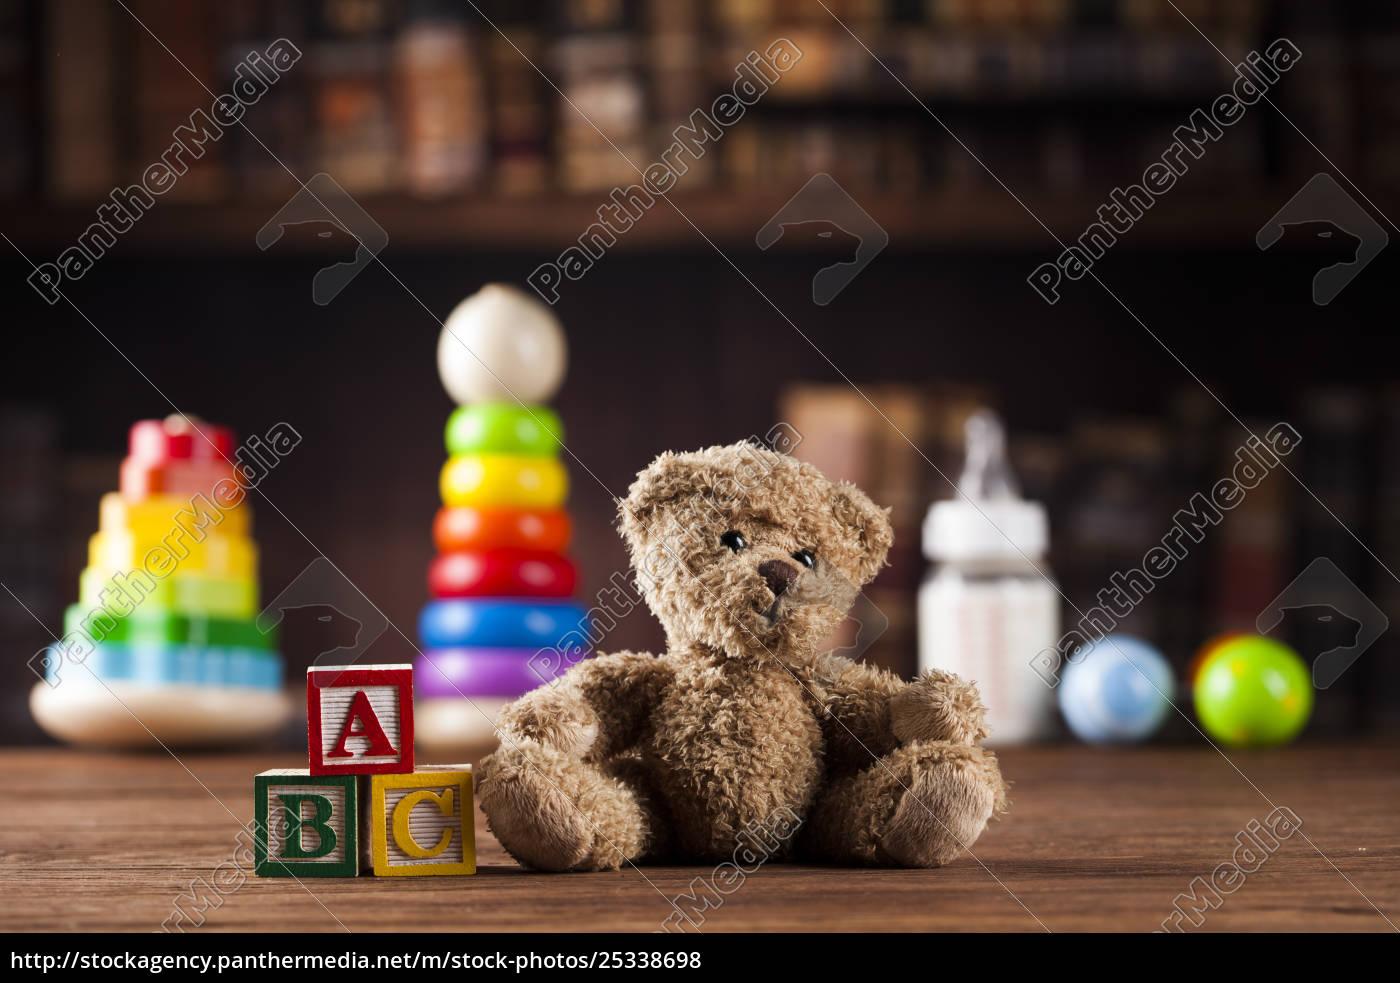 teddy, bear, on, on, vintage, wooden - 25338698